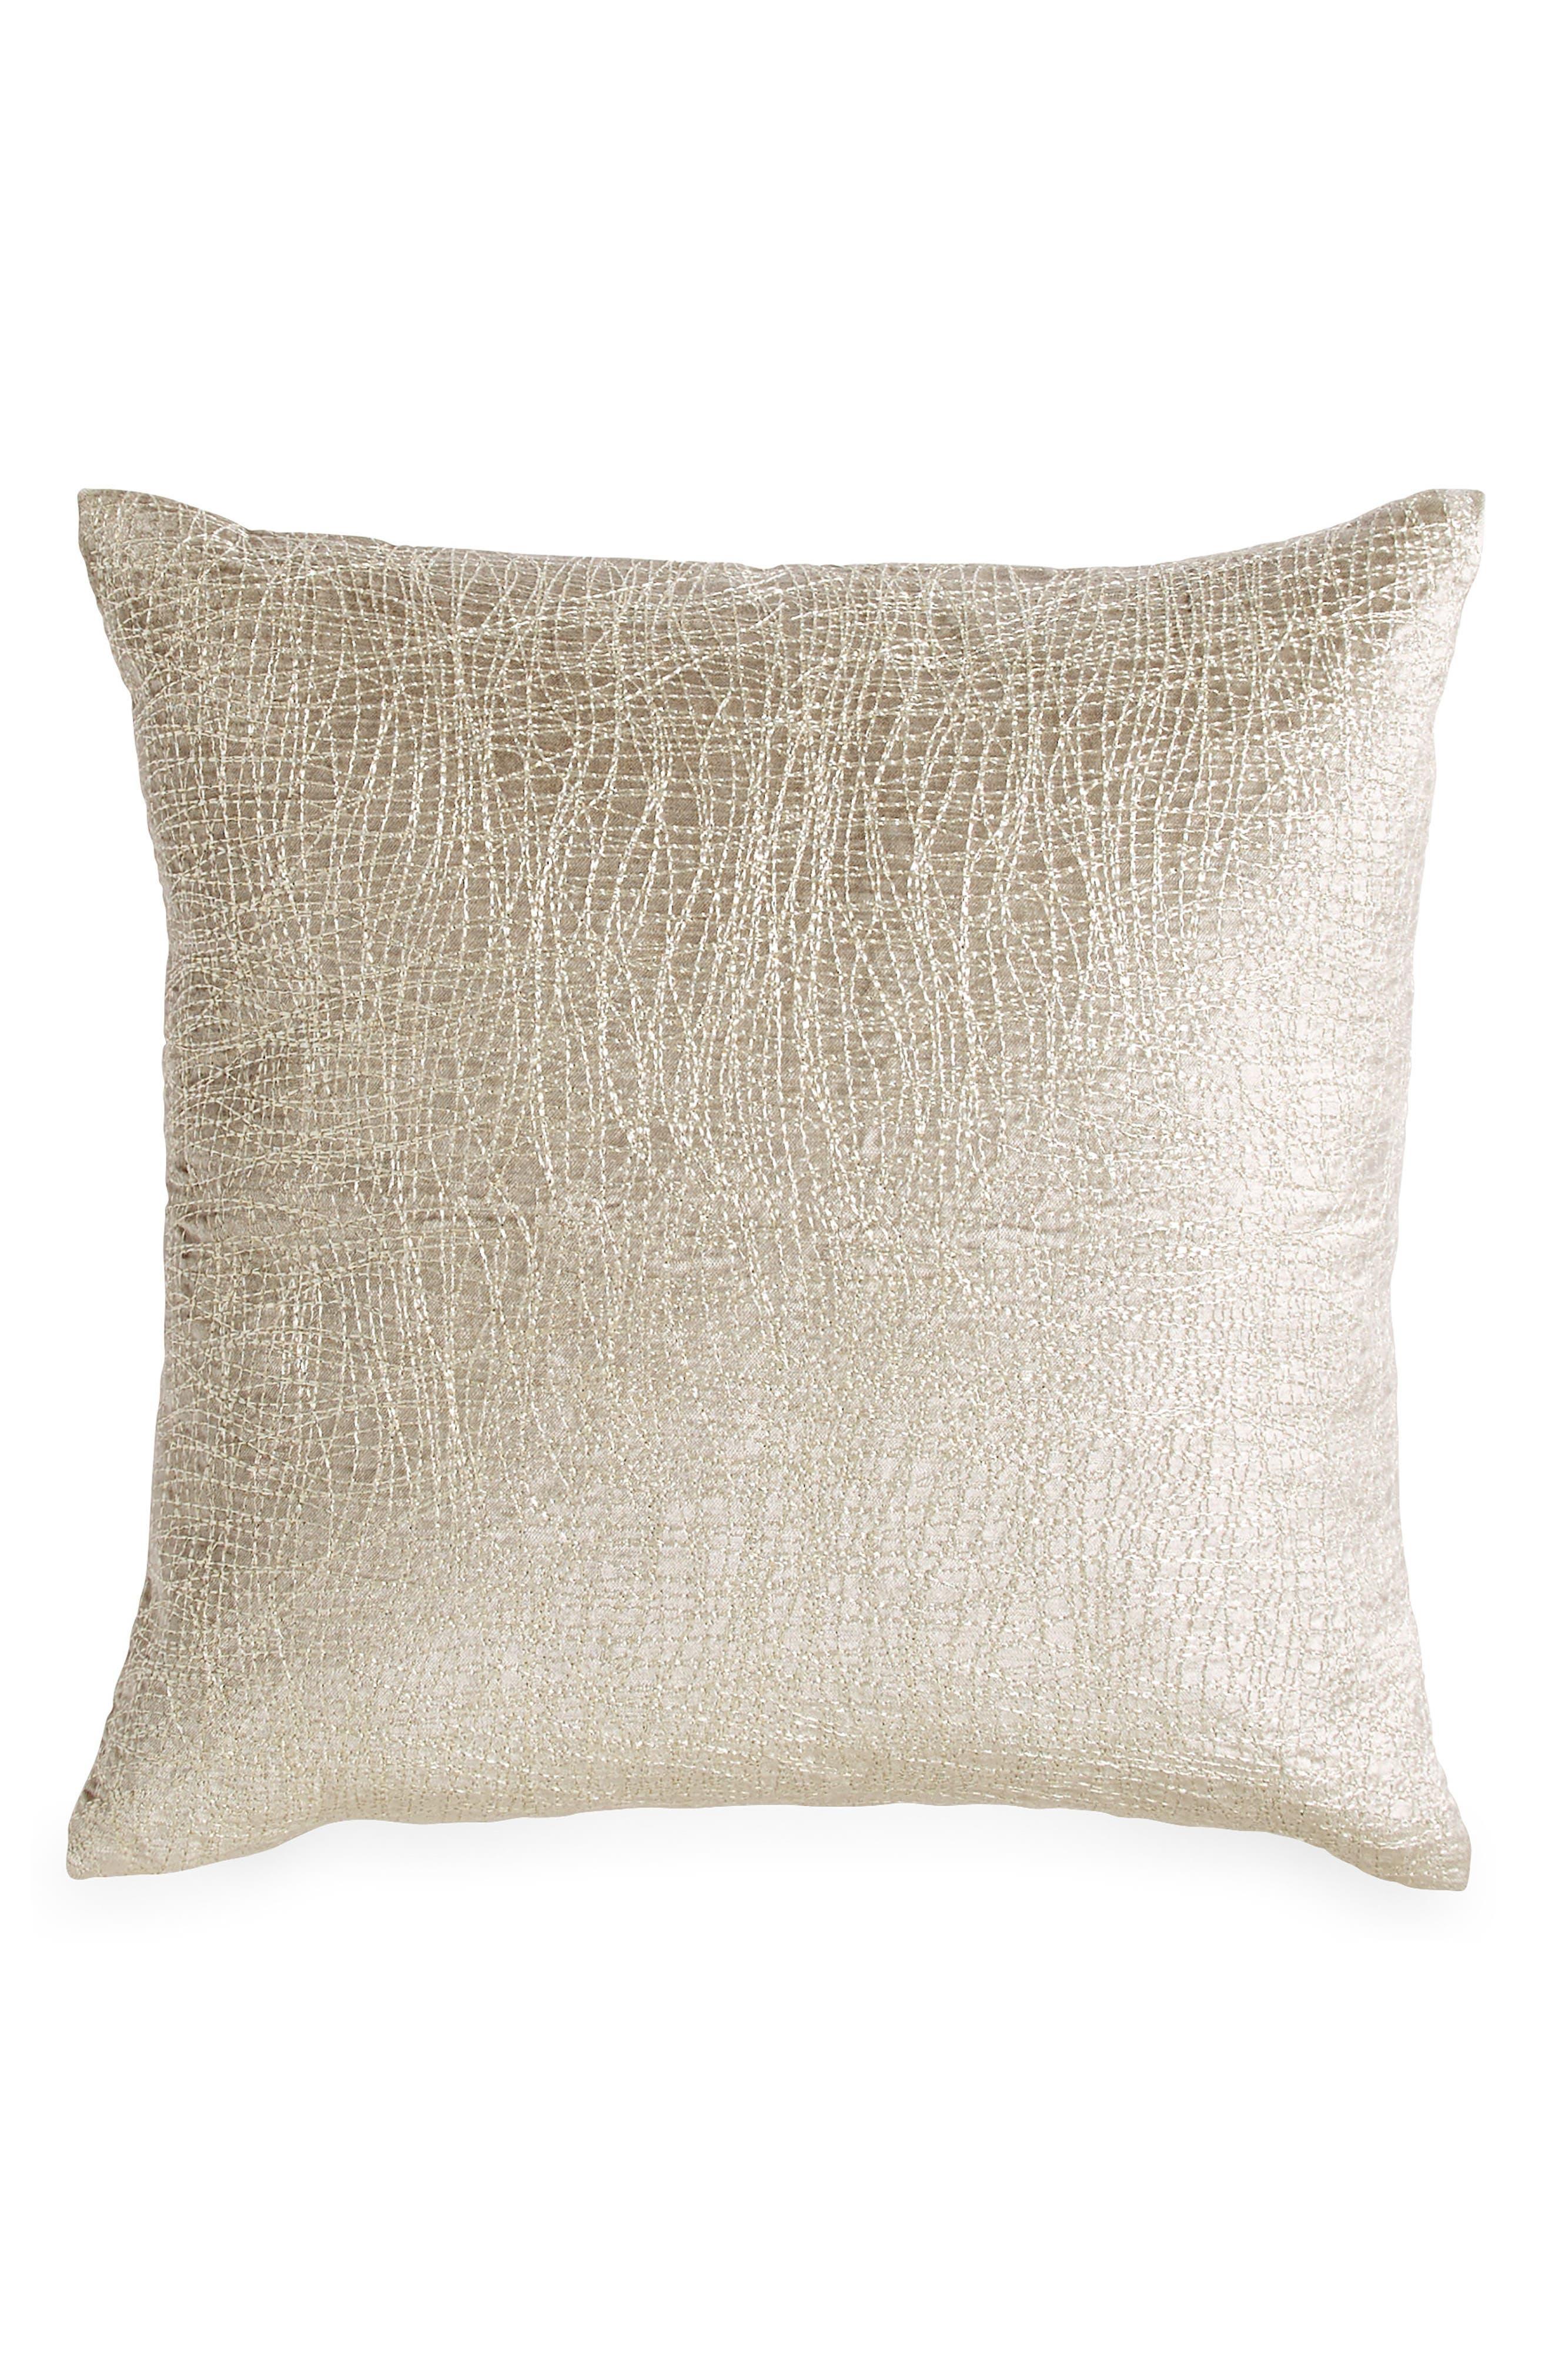 Tidal Accent Pillow,                         Main,                         color,